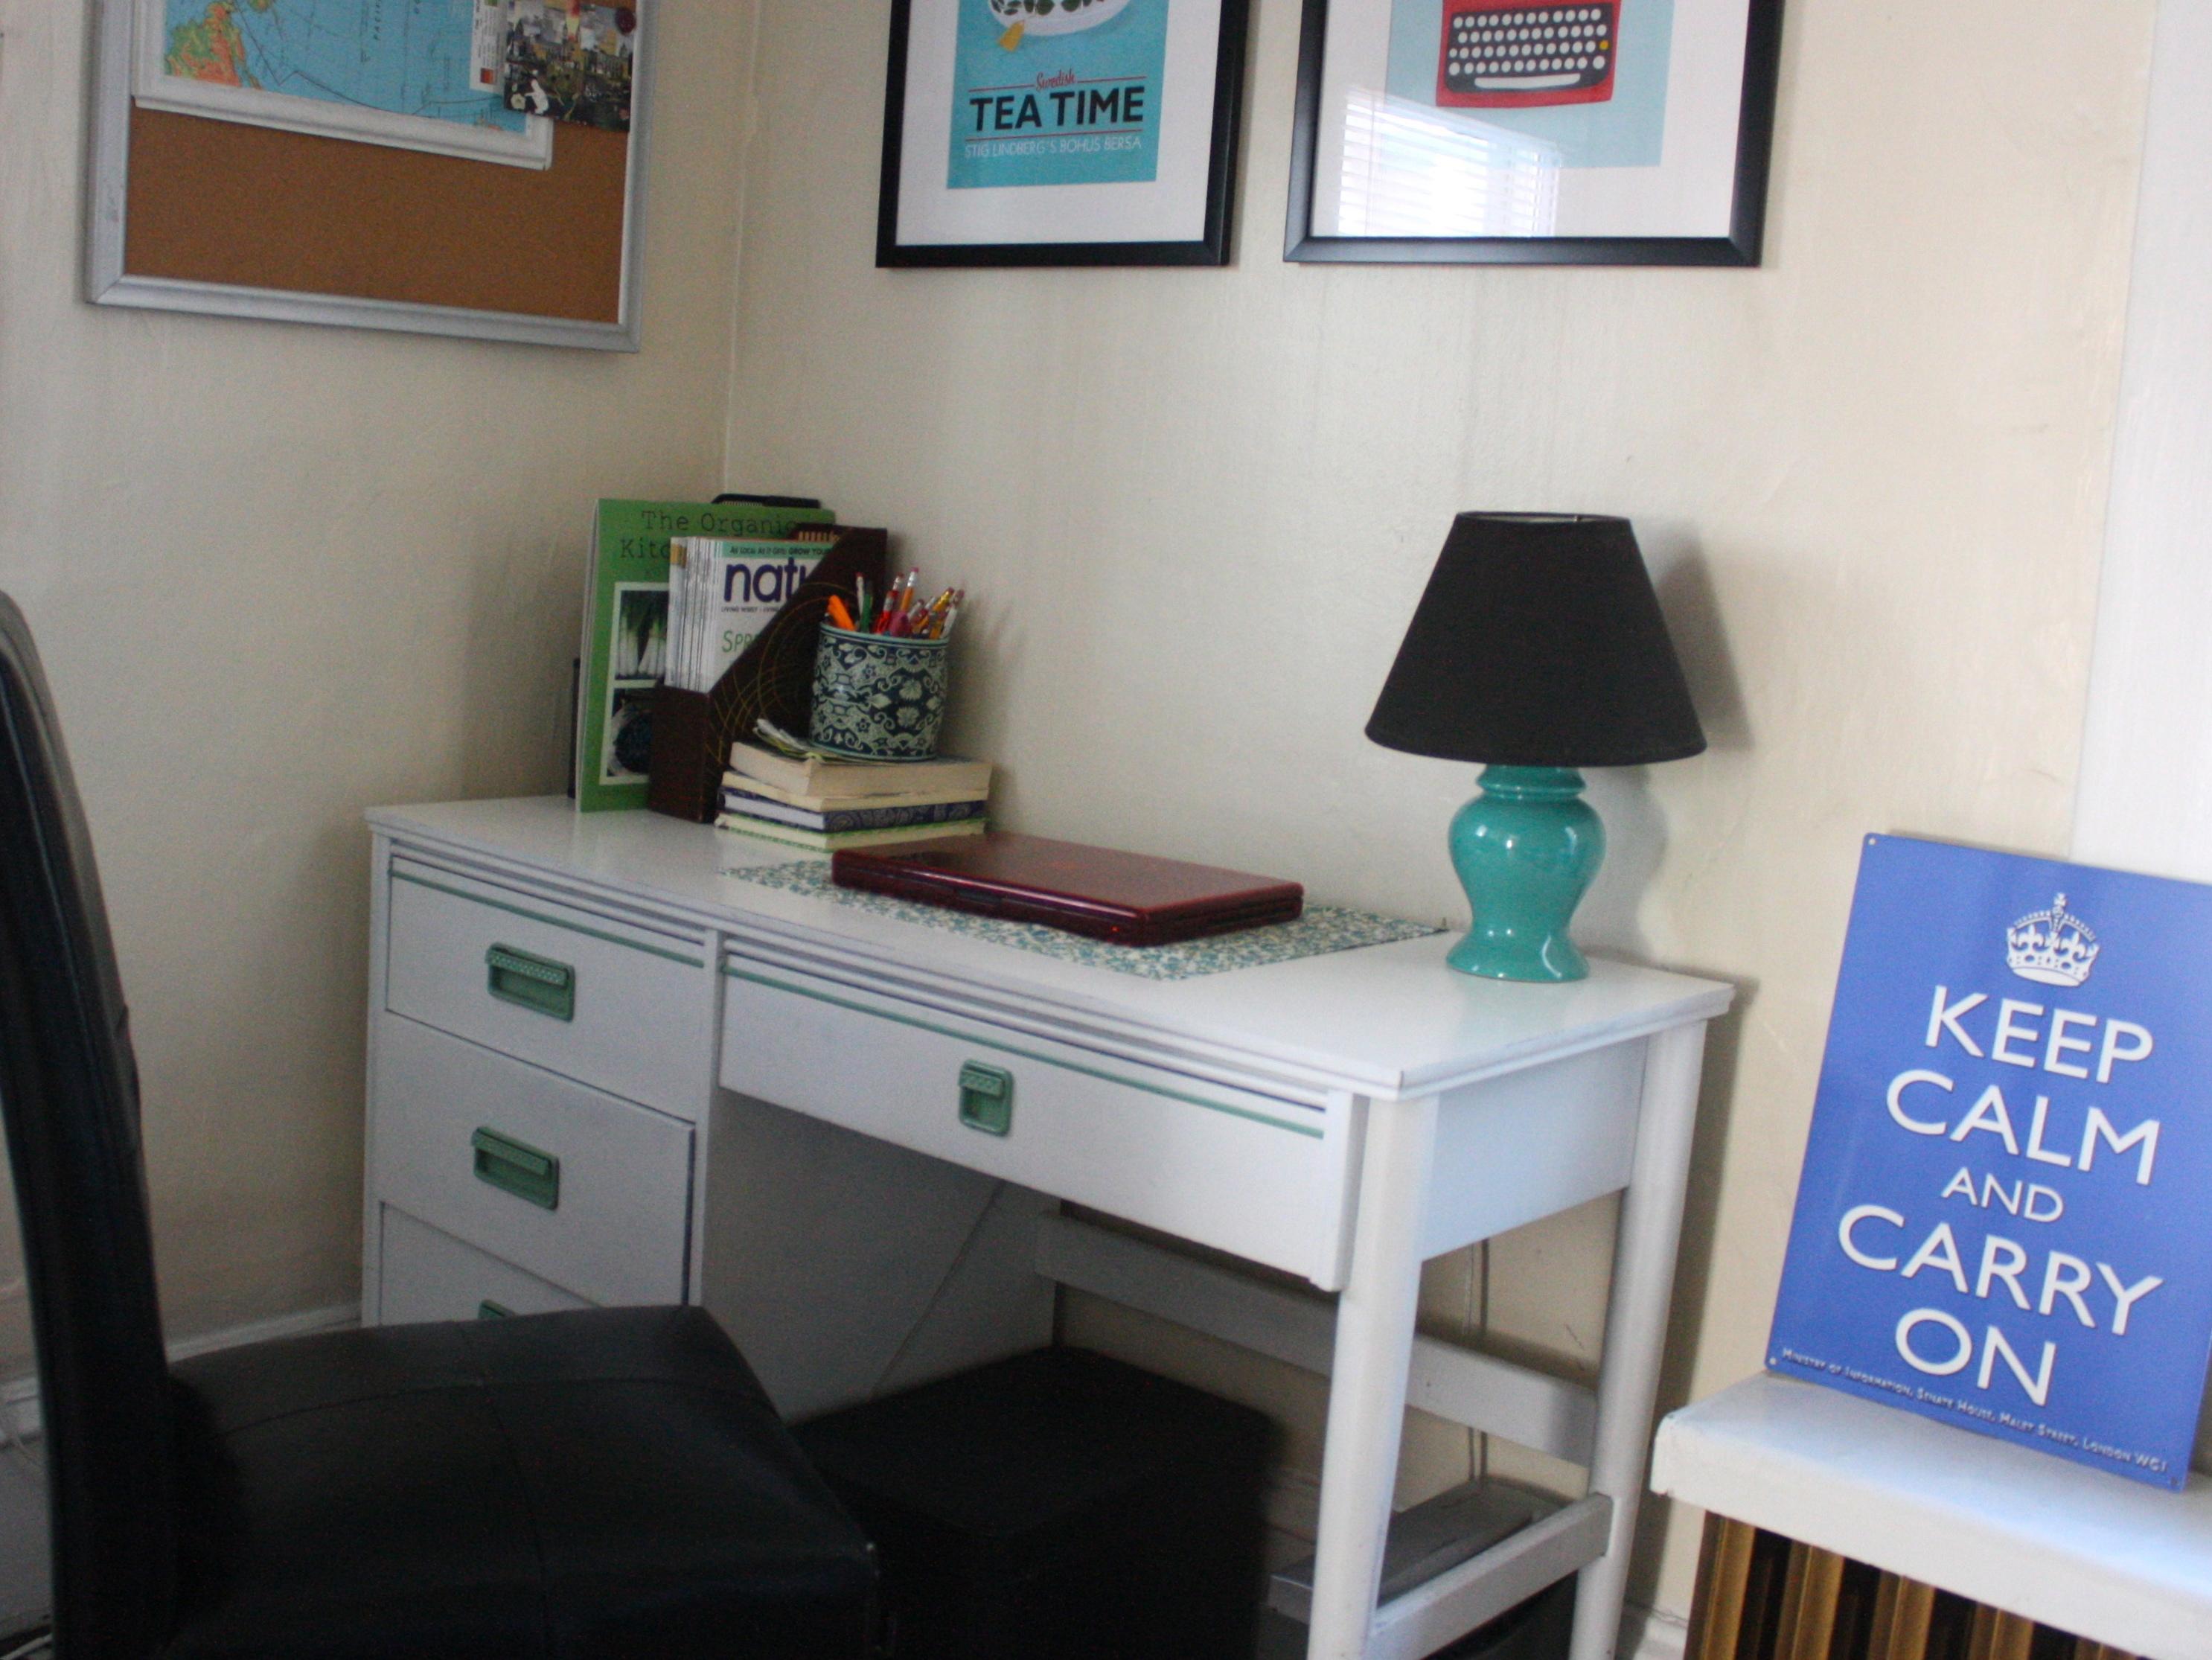 the modern desks you find at furniture stores today often dont offer the same craftsmanship as vintage pieces vintage desks are usually made of solid wood amazing vintage desks